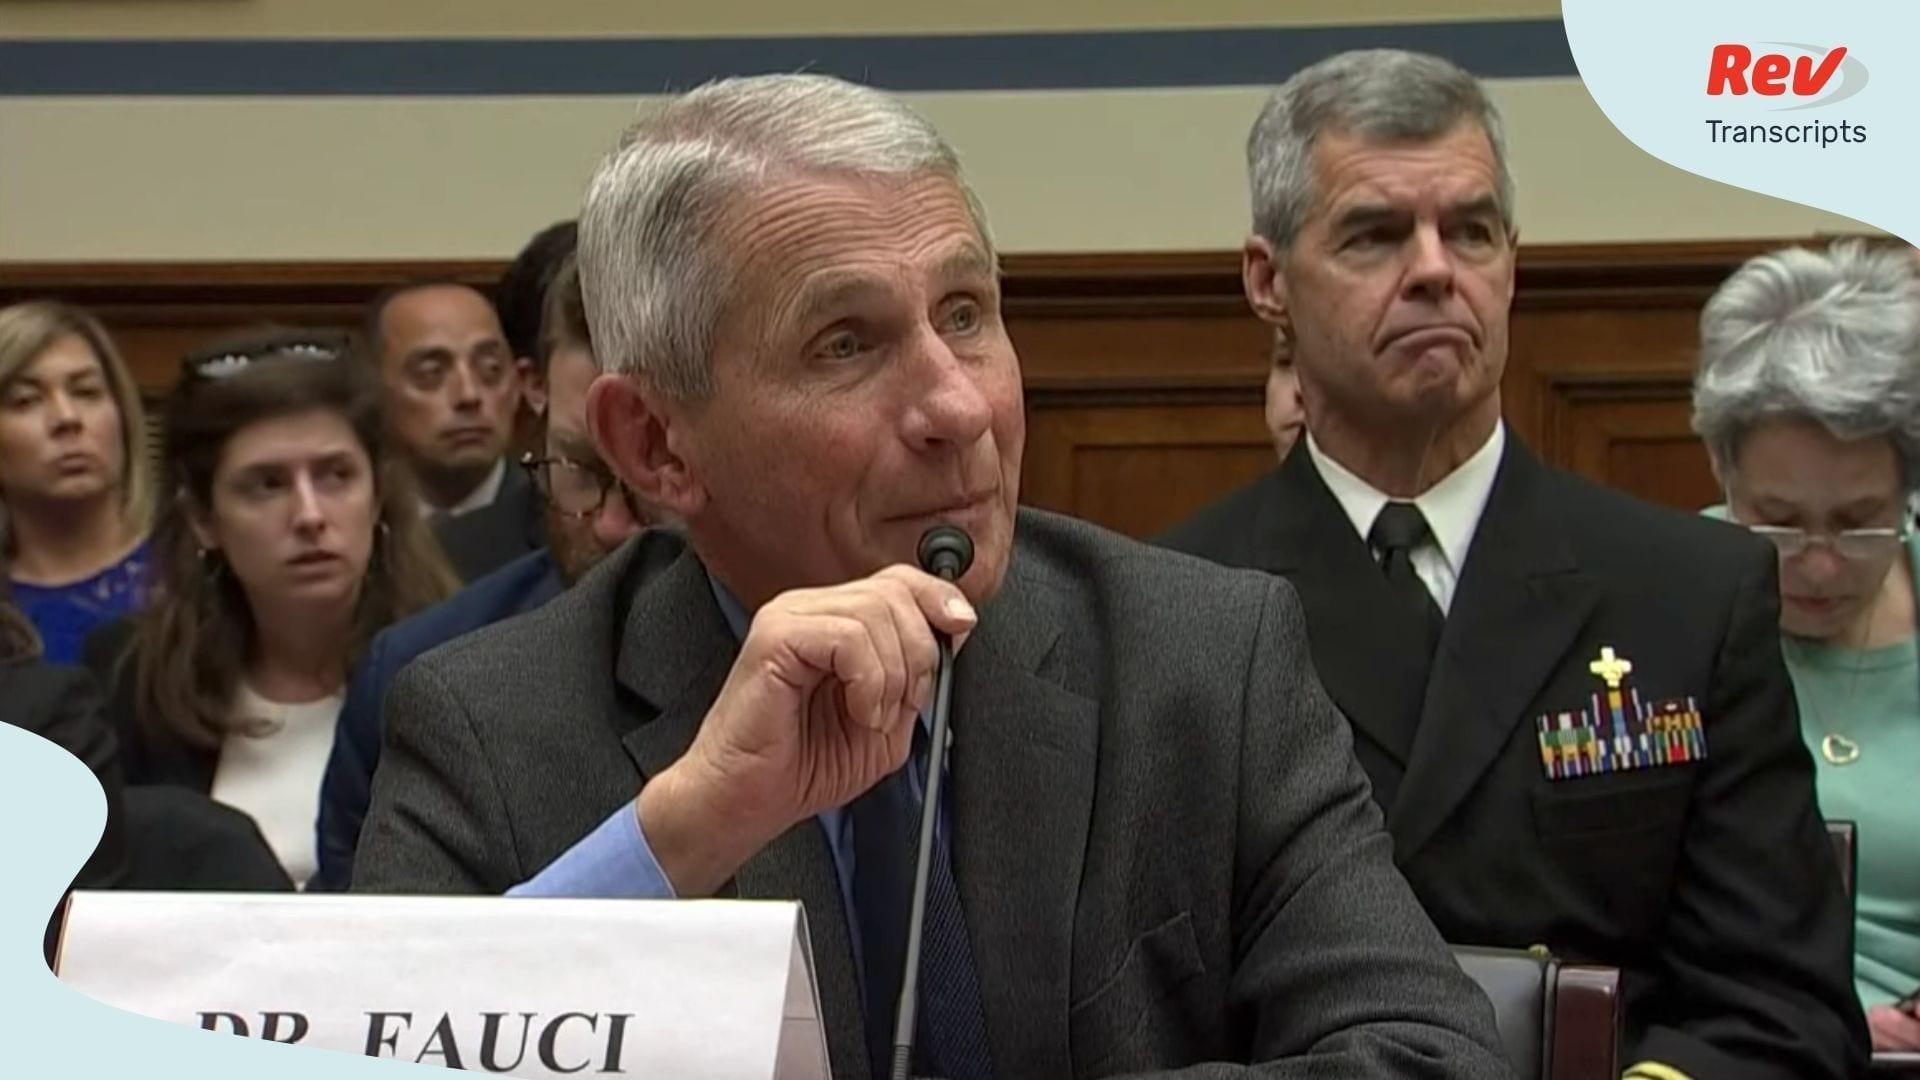 Dr Fauci CDC and NIH Testify on Coronavirus Transcript